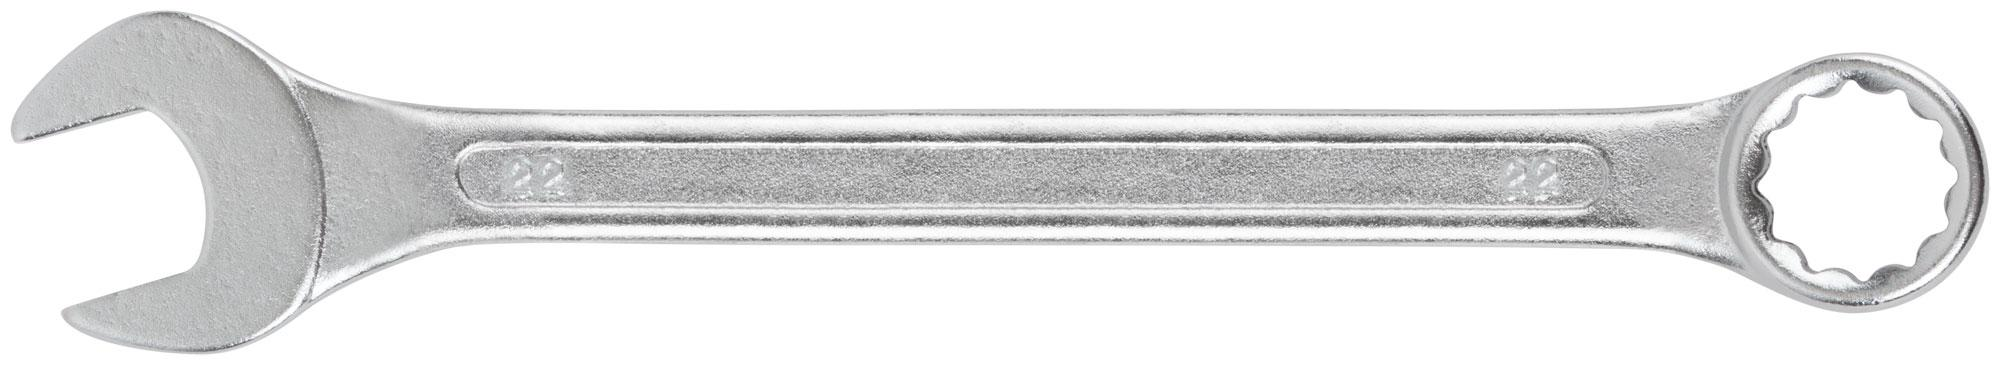 цены Ключ Fit 63152 (22 мм)